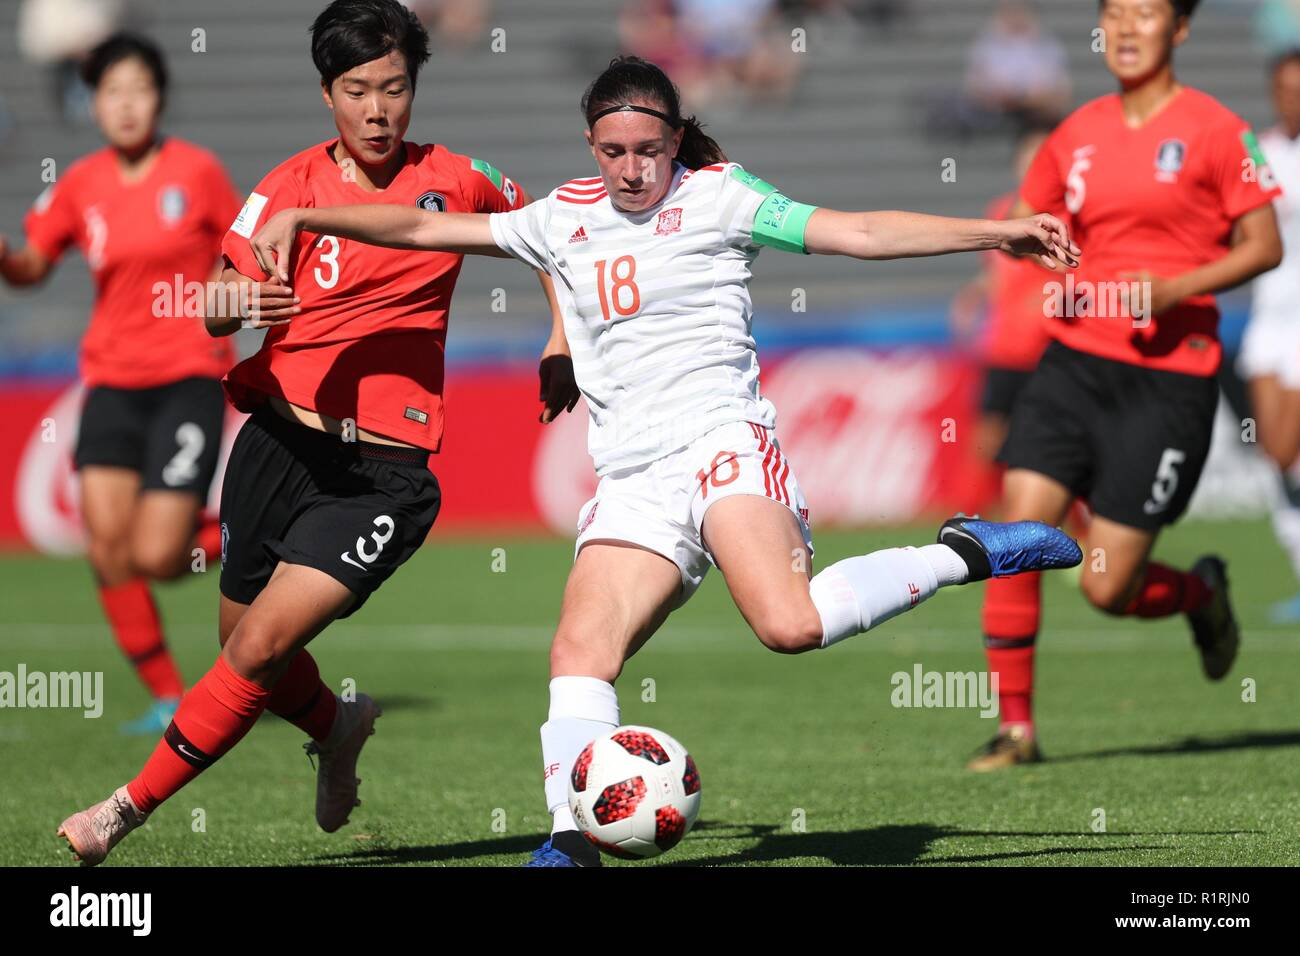 Montevideo Uruguay 14th Nov 2018 Spanish Eva Navaro C Vies